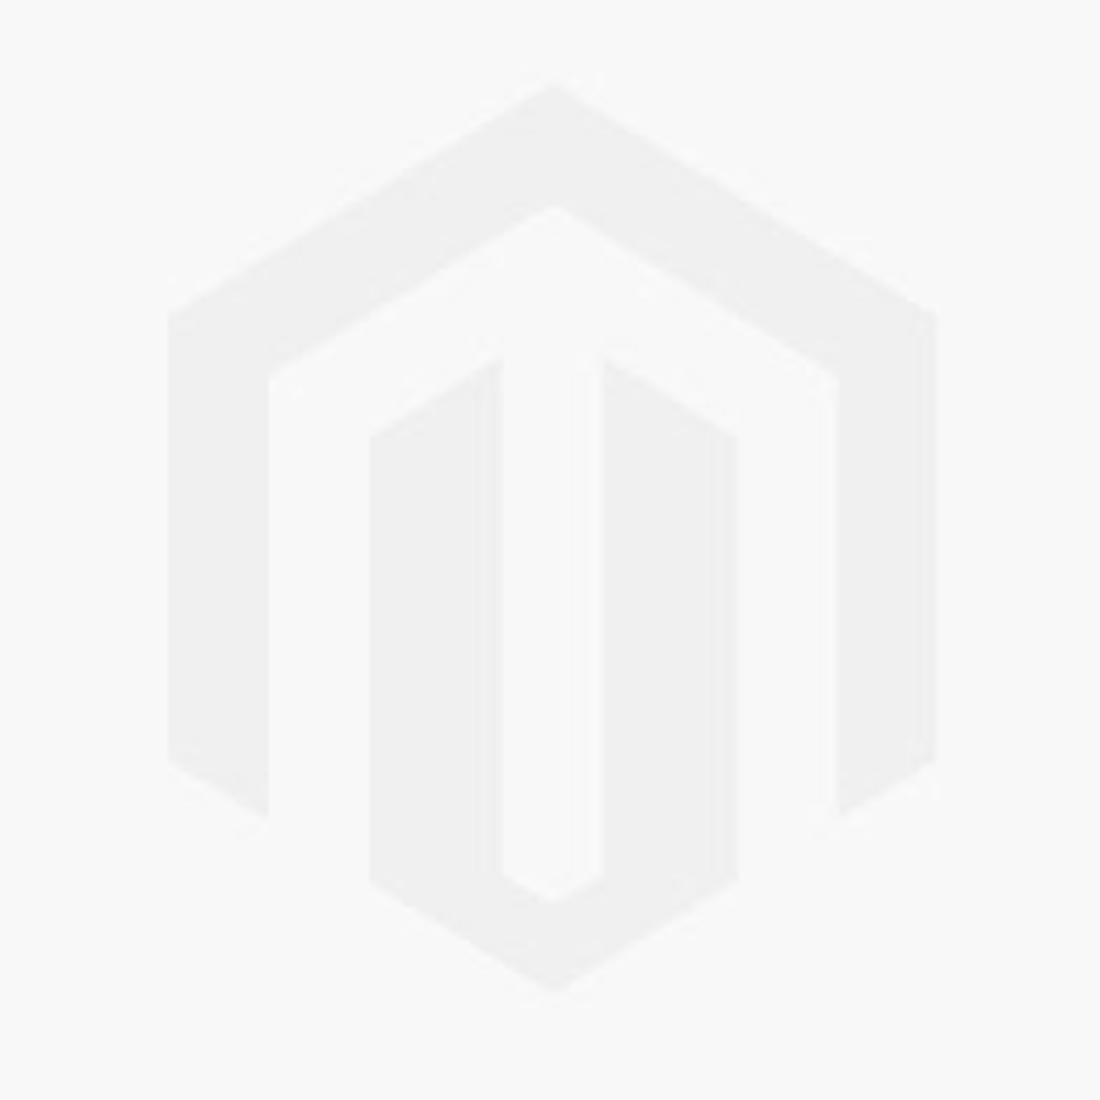 Kuretake Fudebiyori Metallic Brush Pen Green